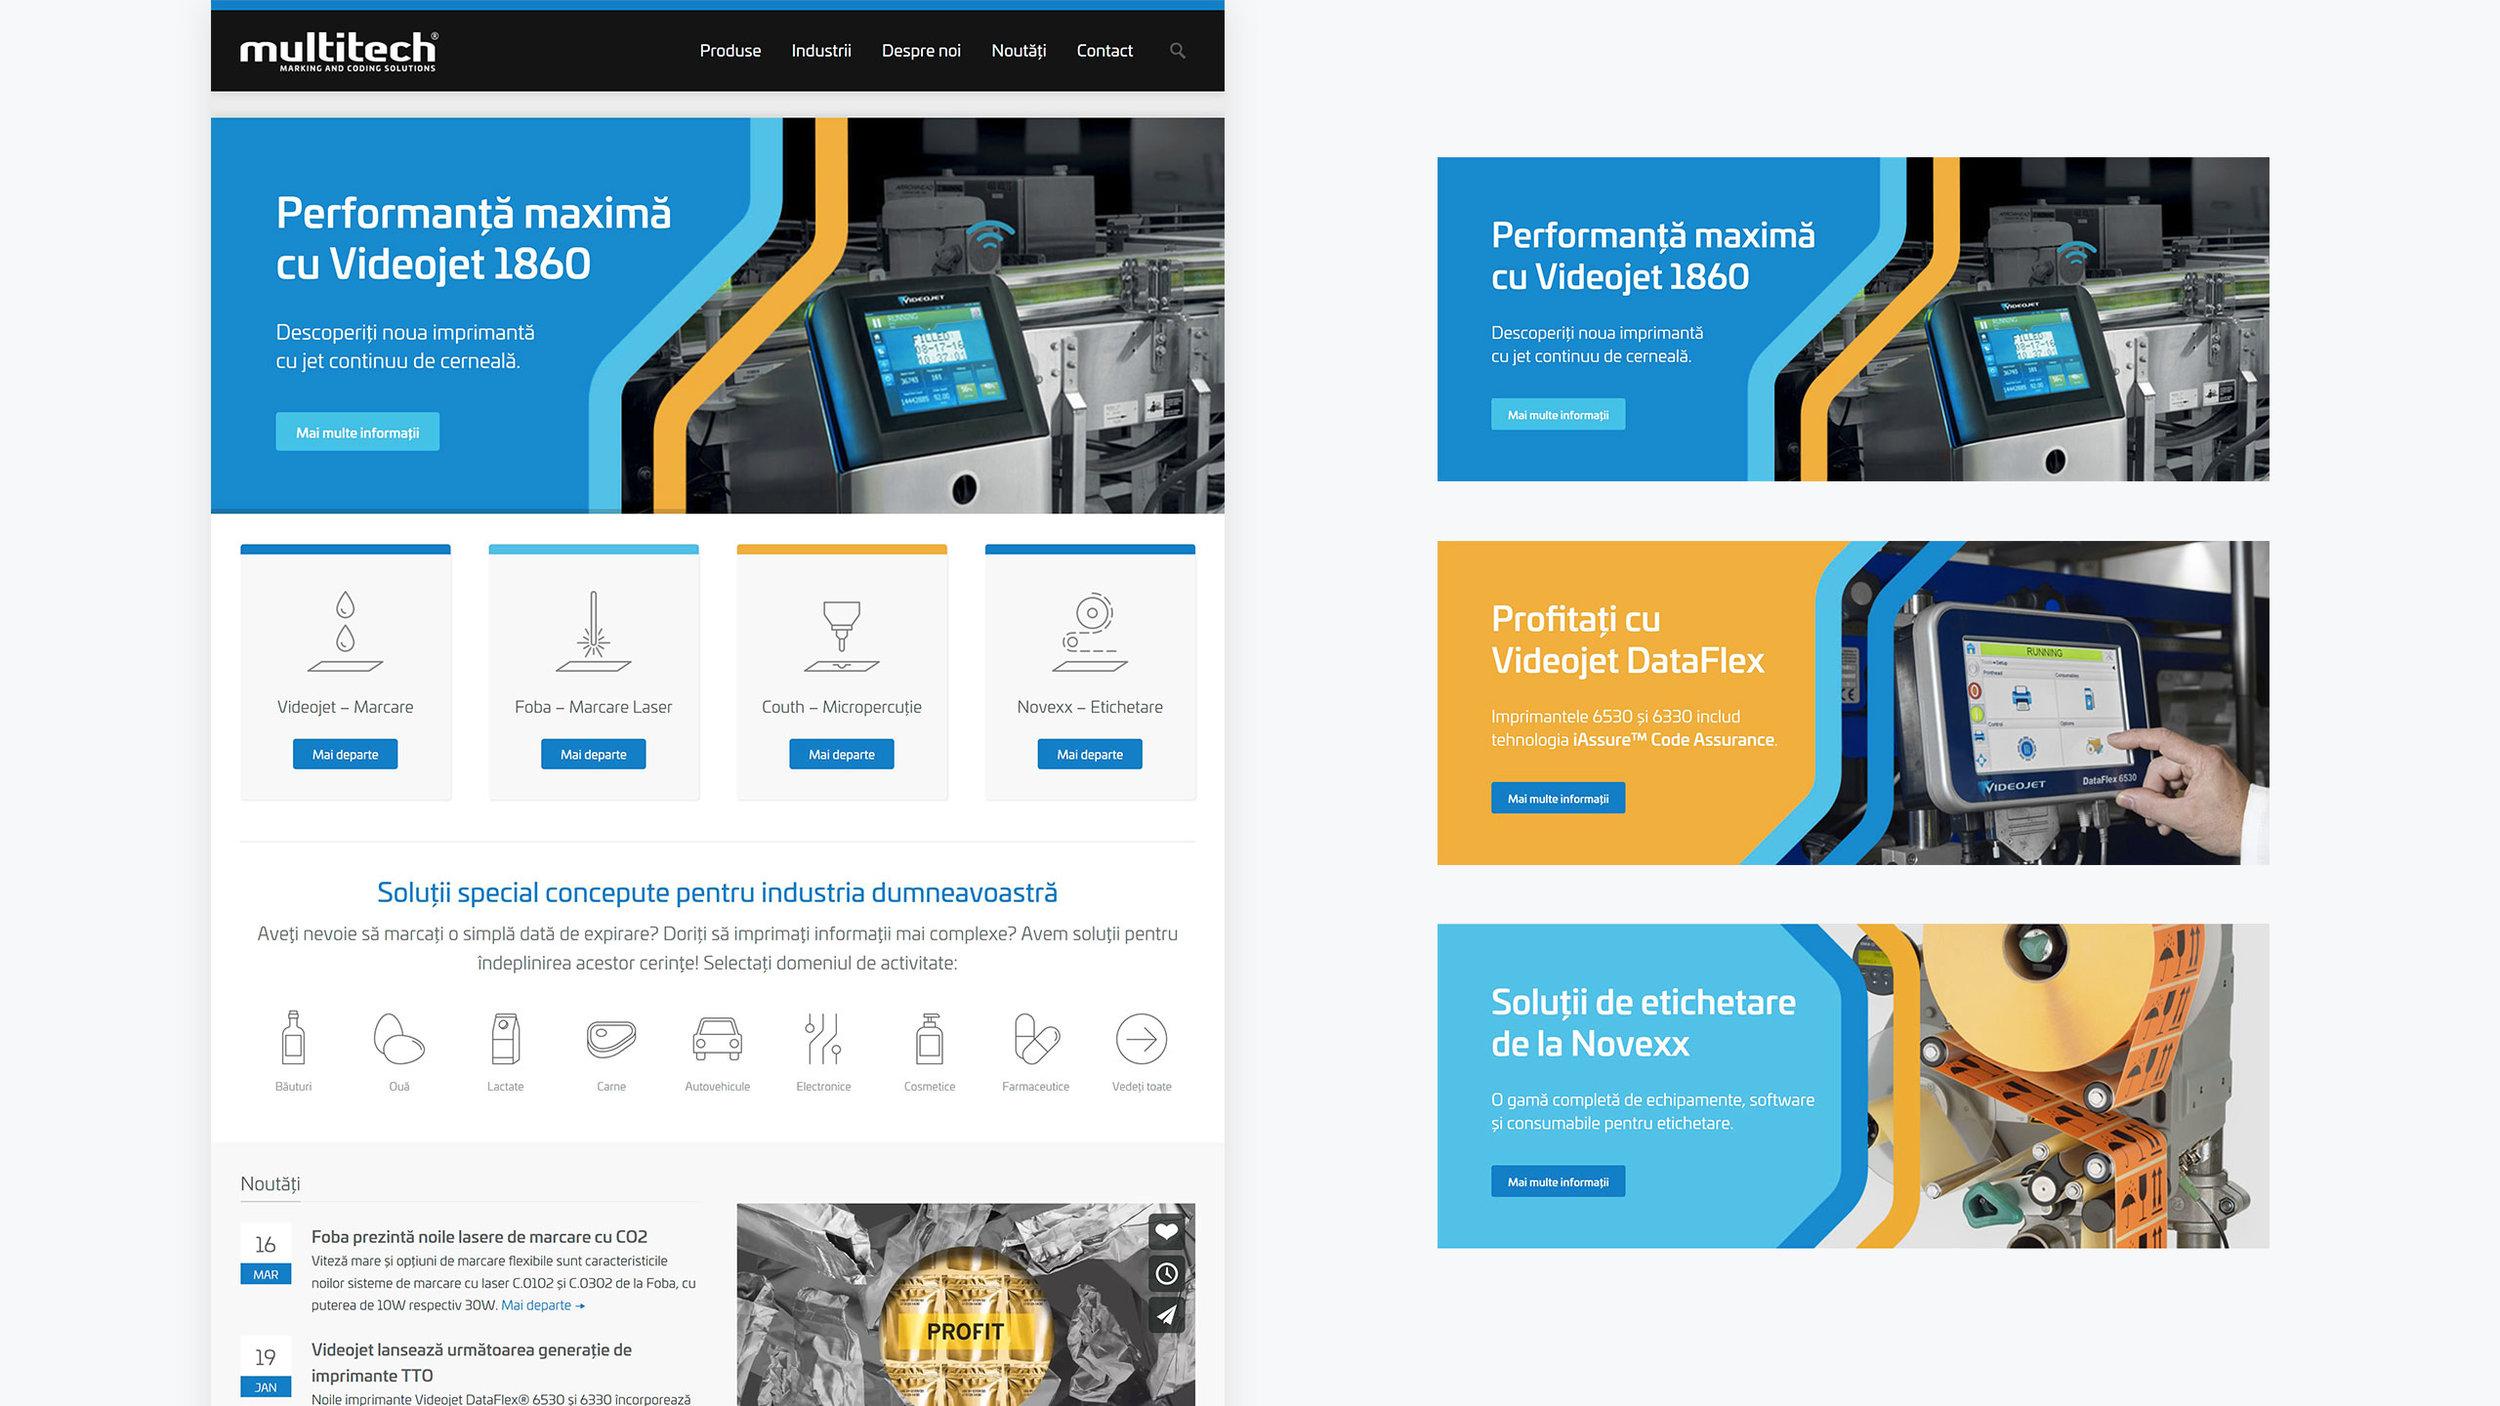 Bisigned - Multitech brand identity design - Website banner design